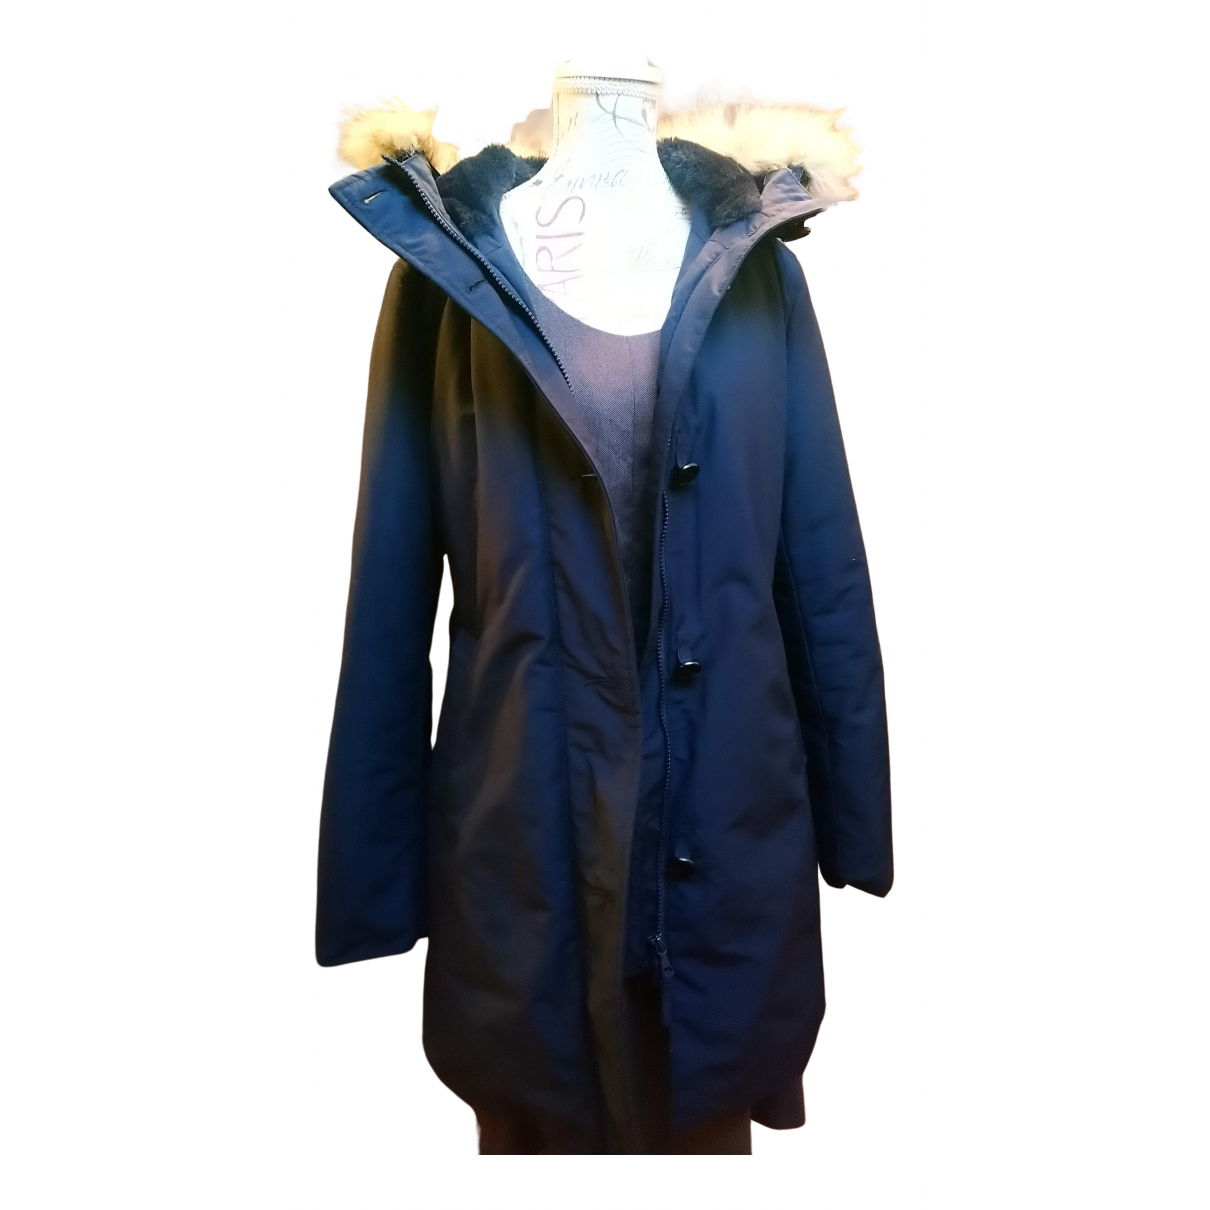 Uniqlo \N Navy coat for Women S International